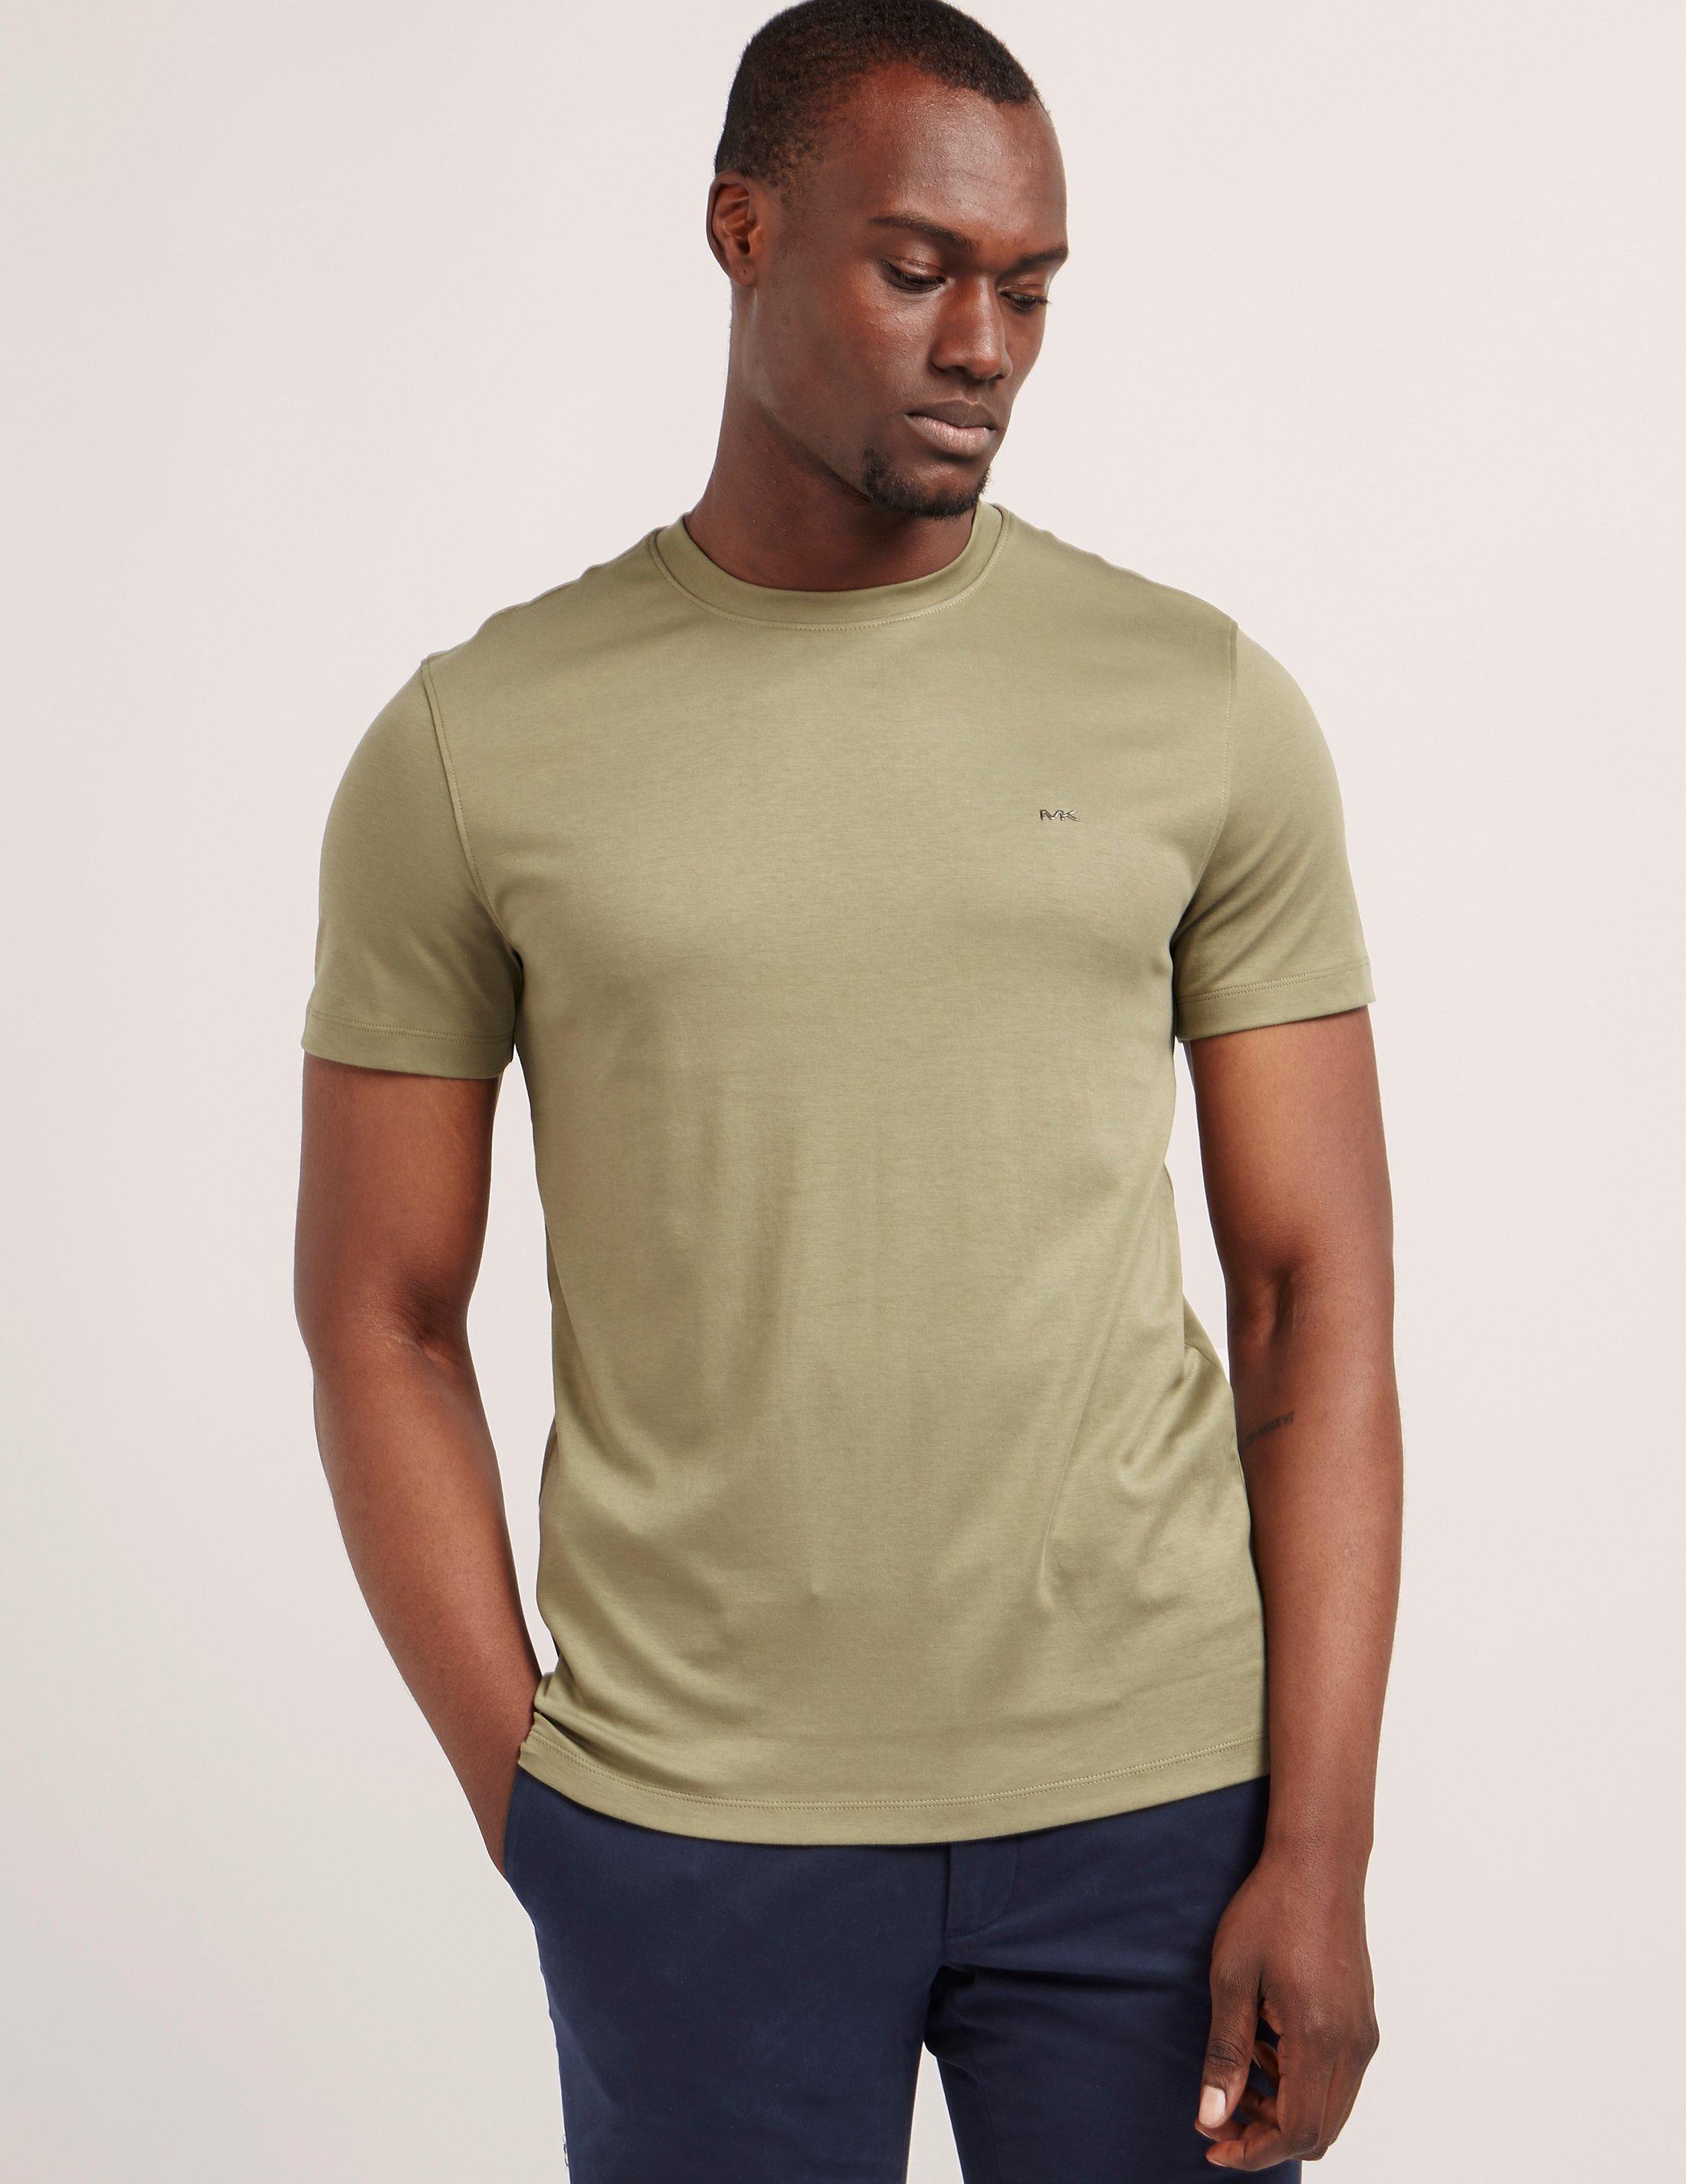 3d7dd486 Michael Kors Short Sleeve Sleek T-shirt for Men - Lyst